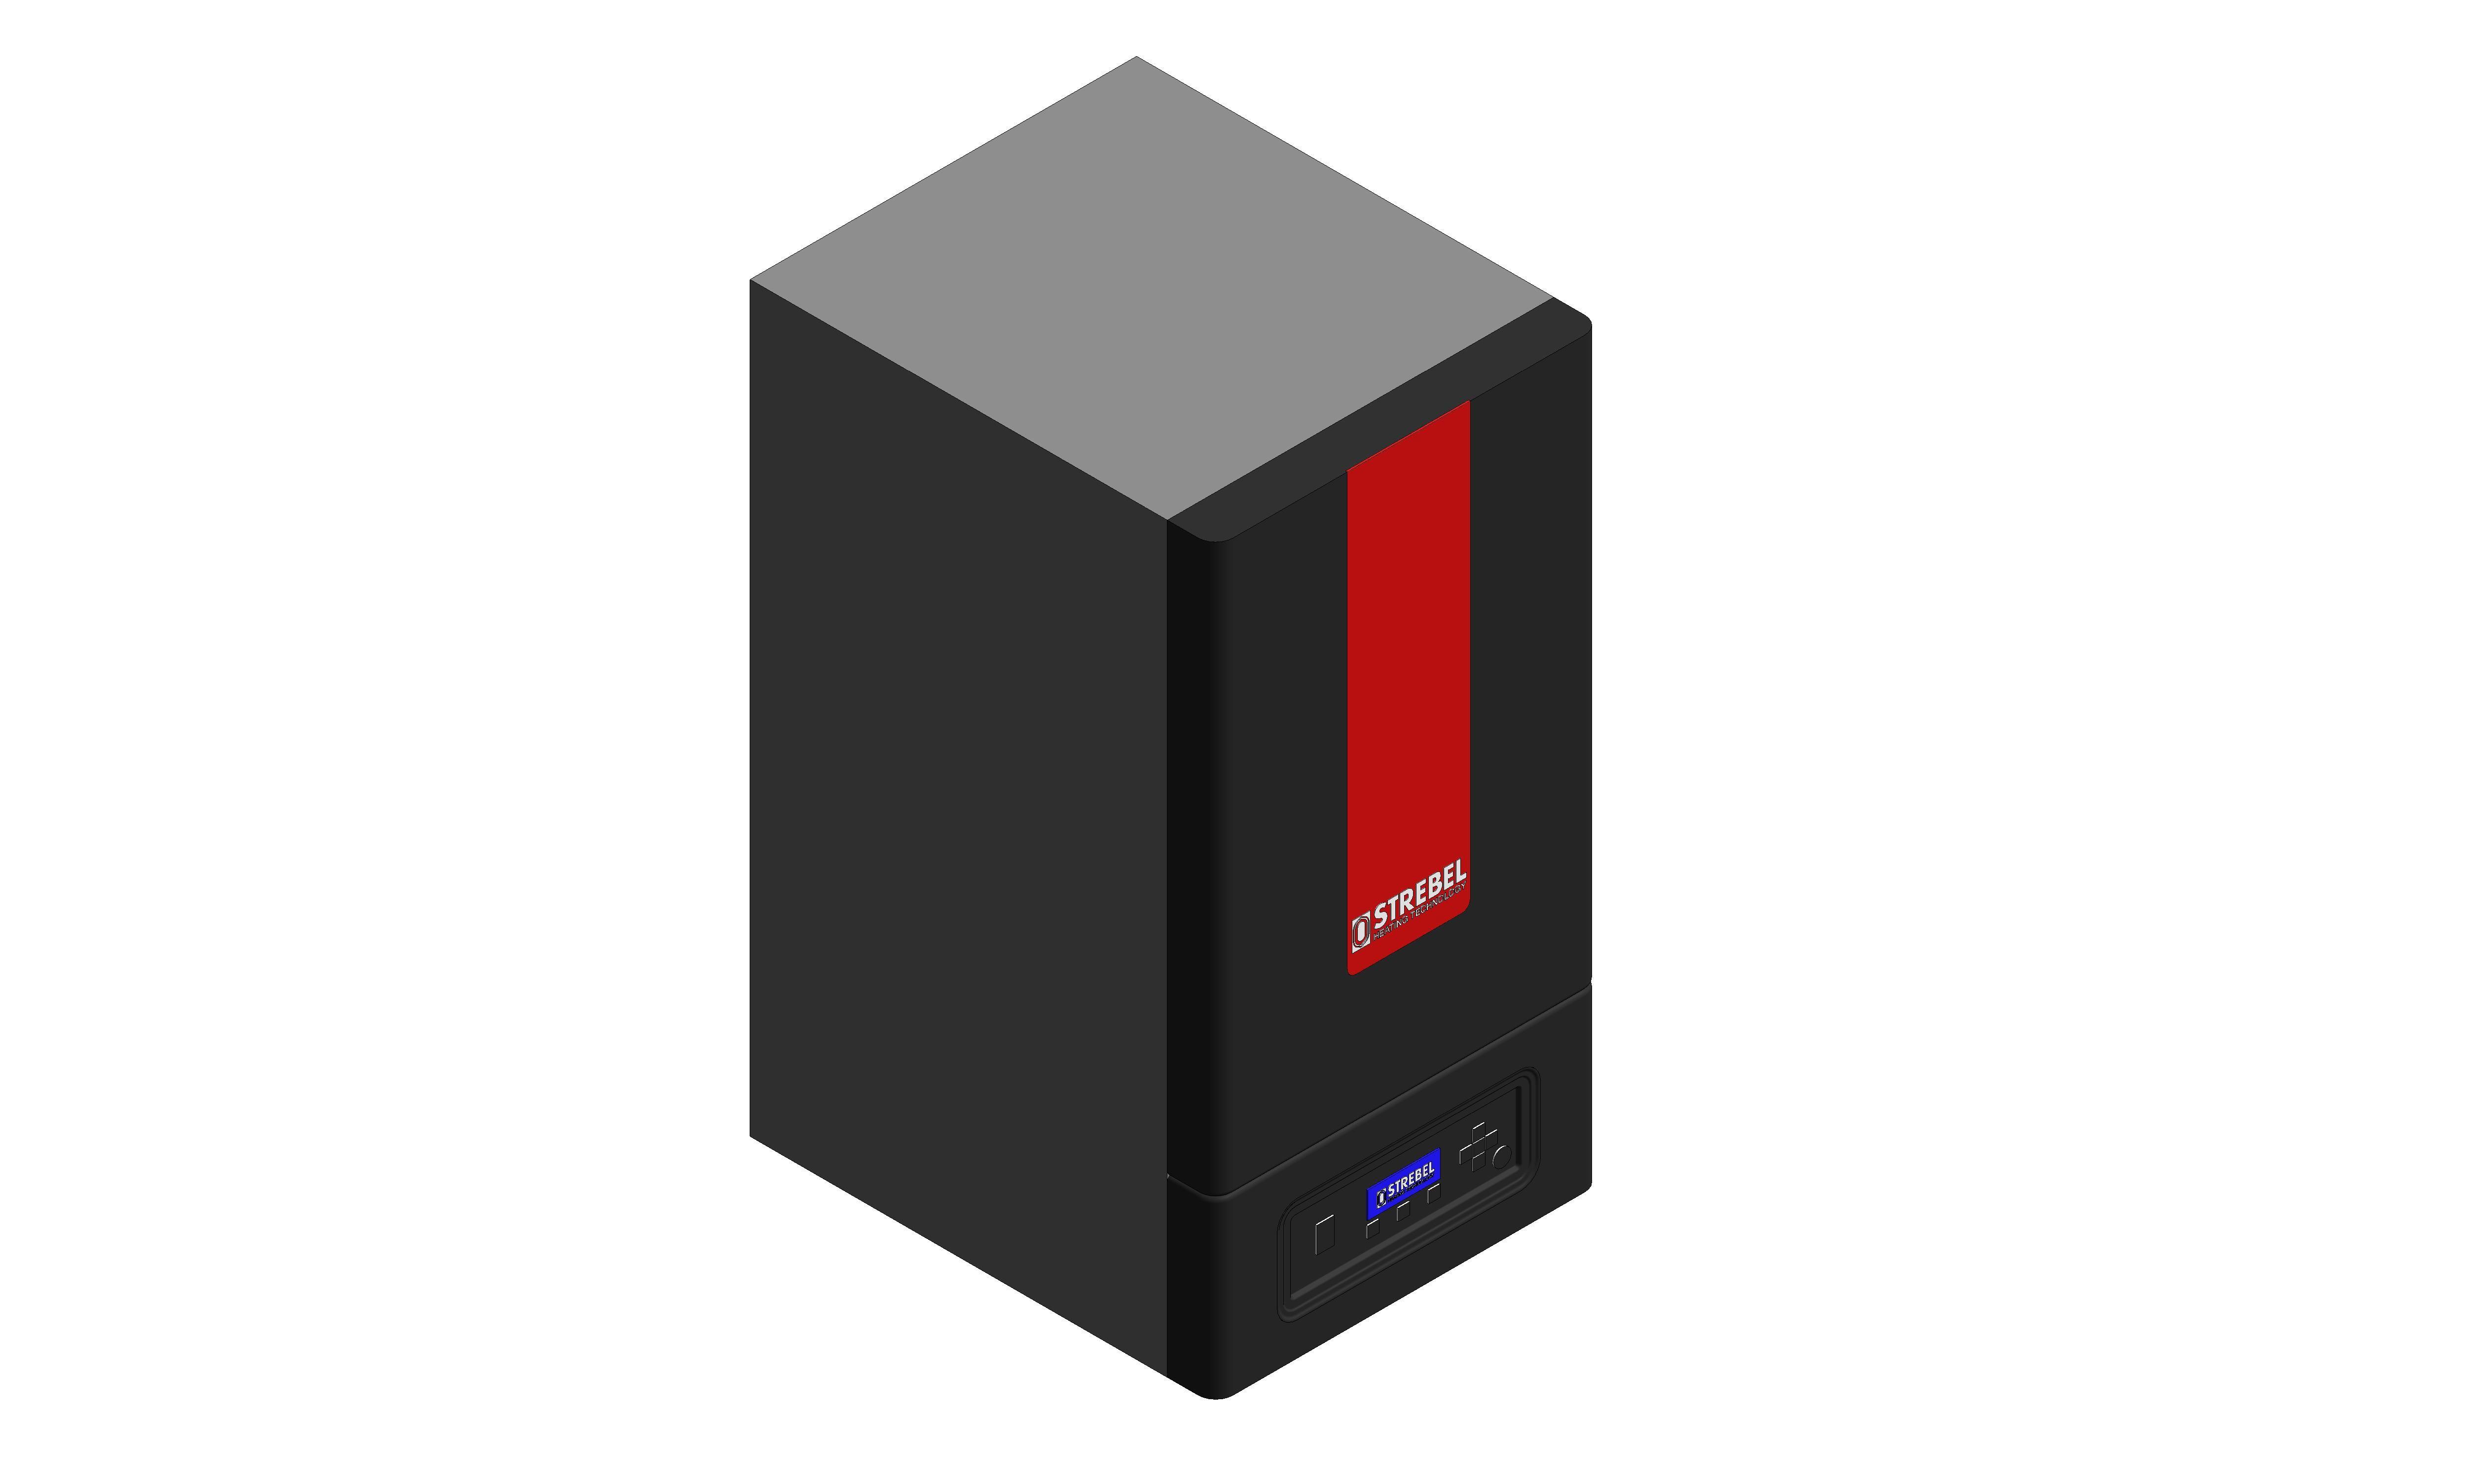 Iso image of strebel s-cbx boiler